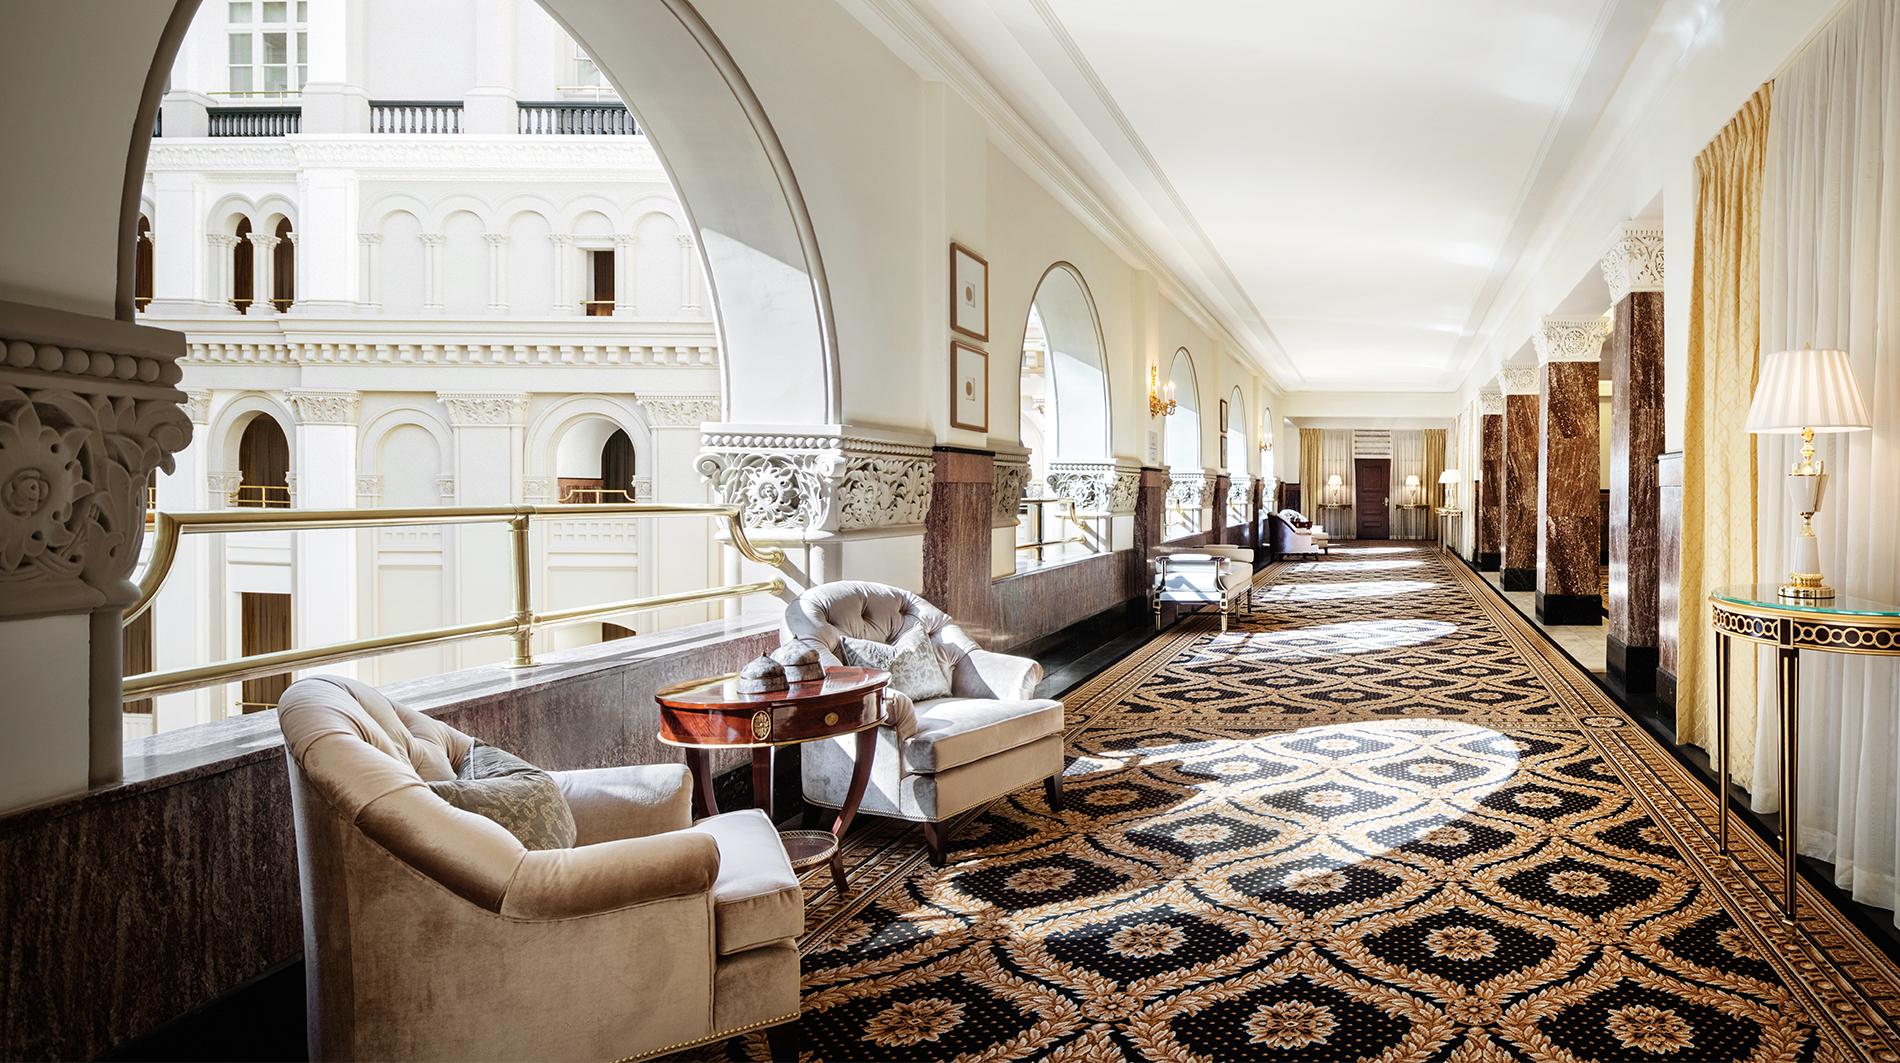 Trump international hotel washington dc Benjamin corridor